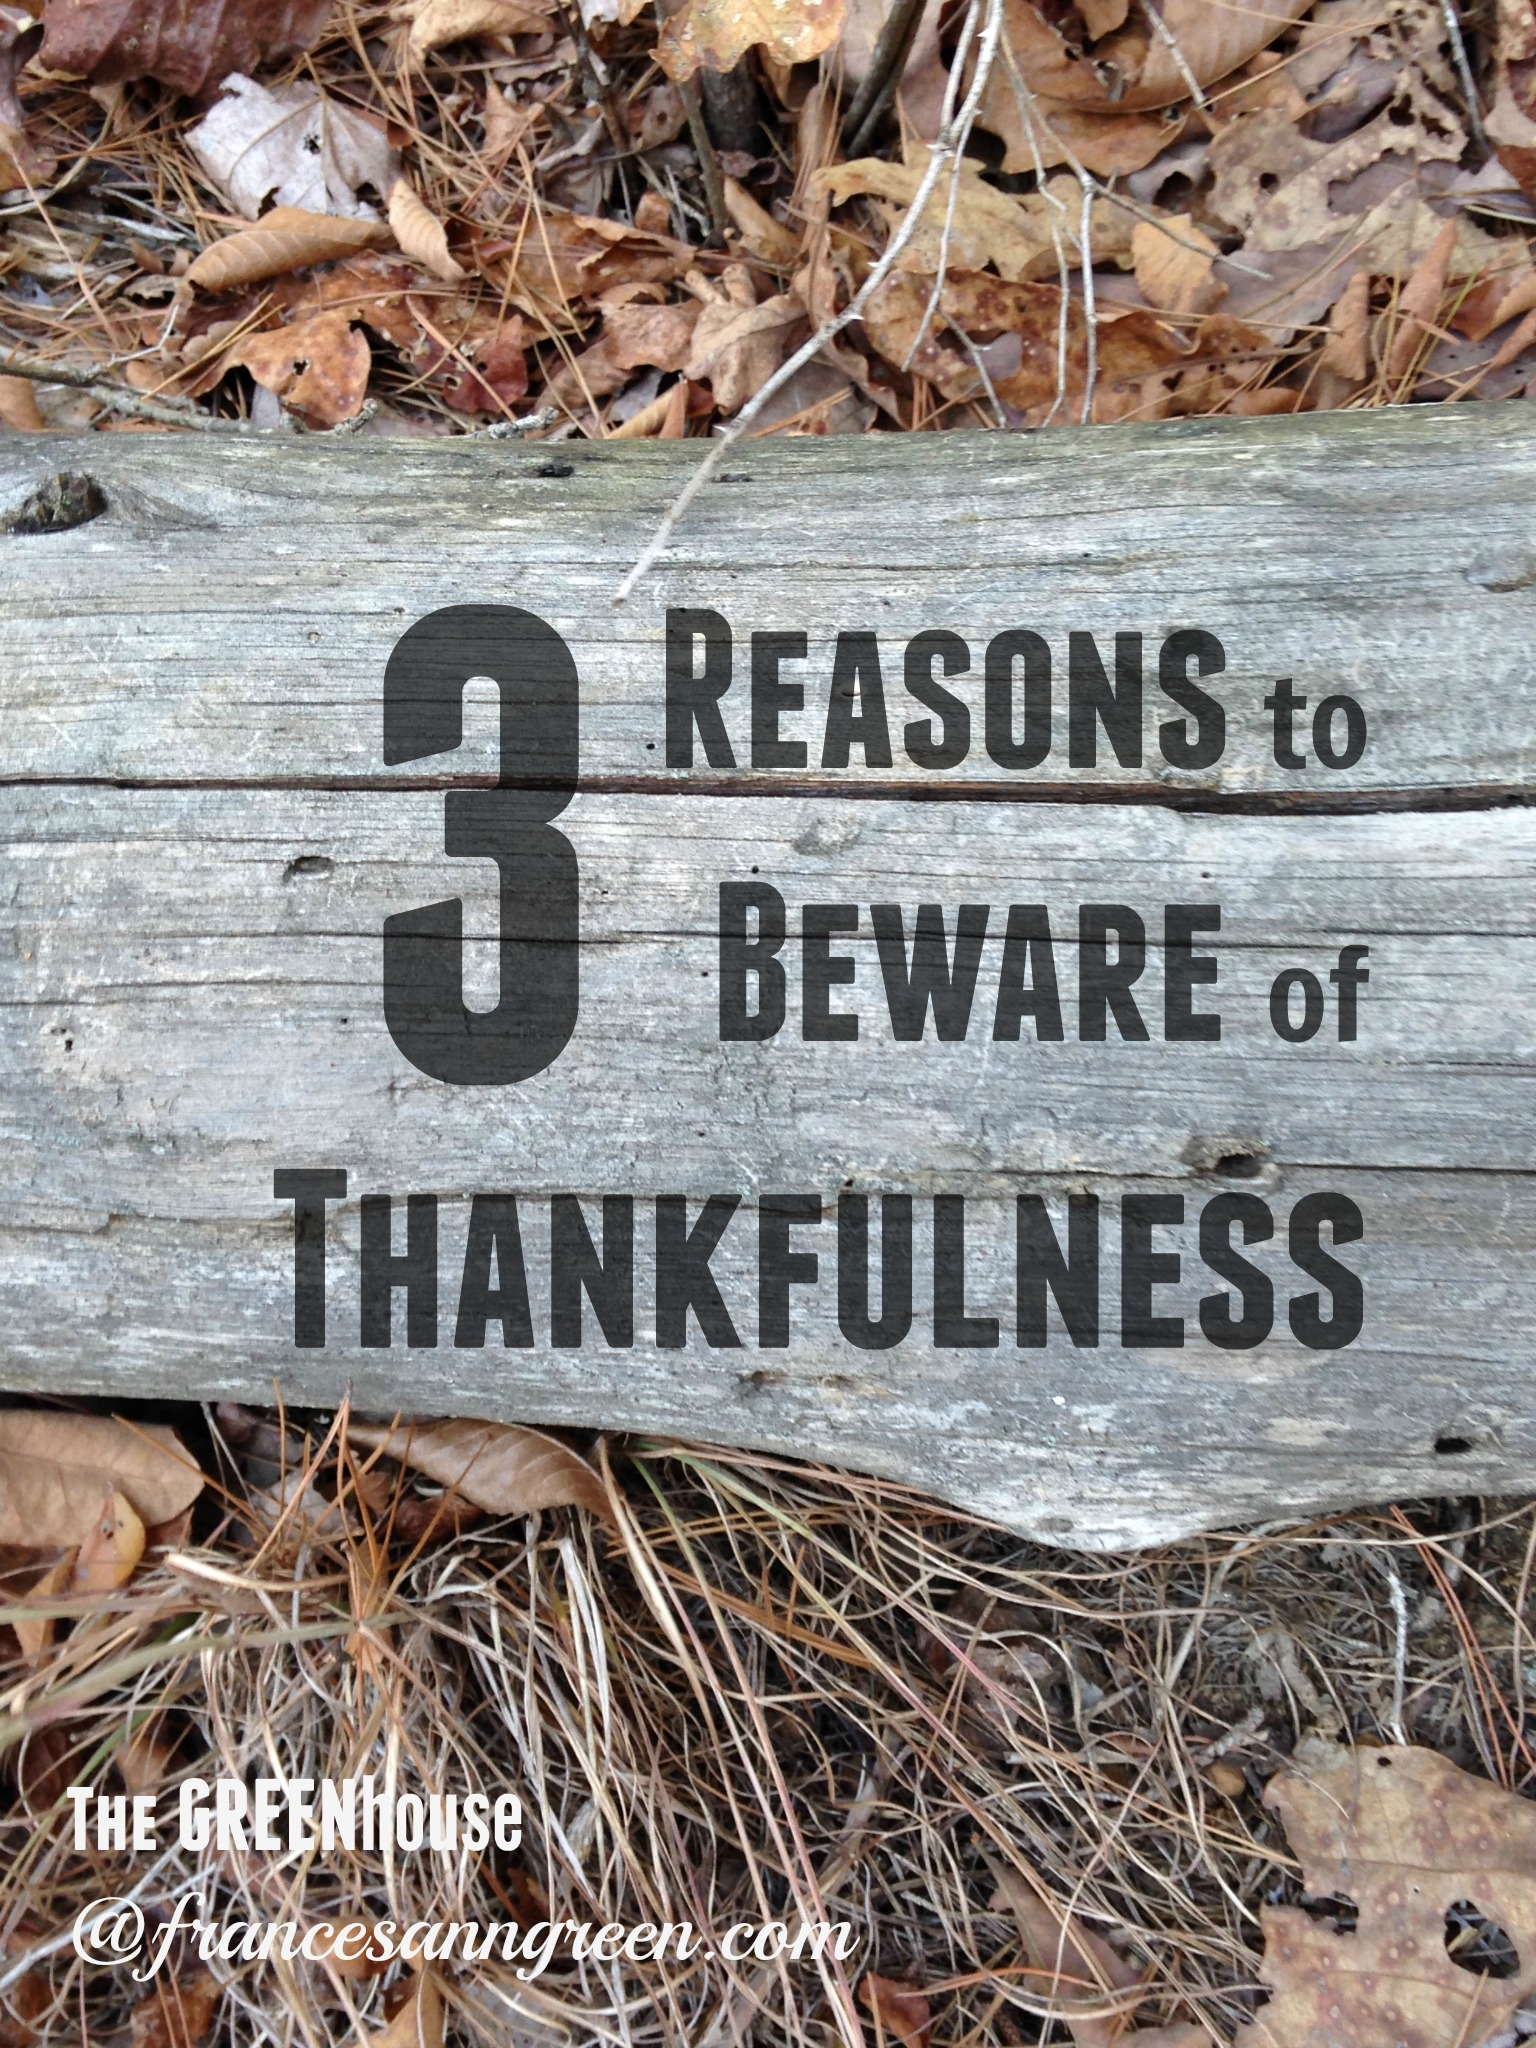 3 Reasons to Beware of Thankfulness